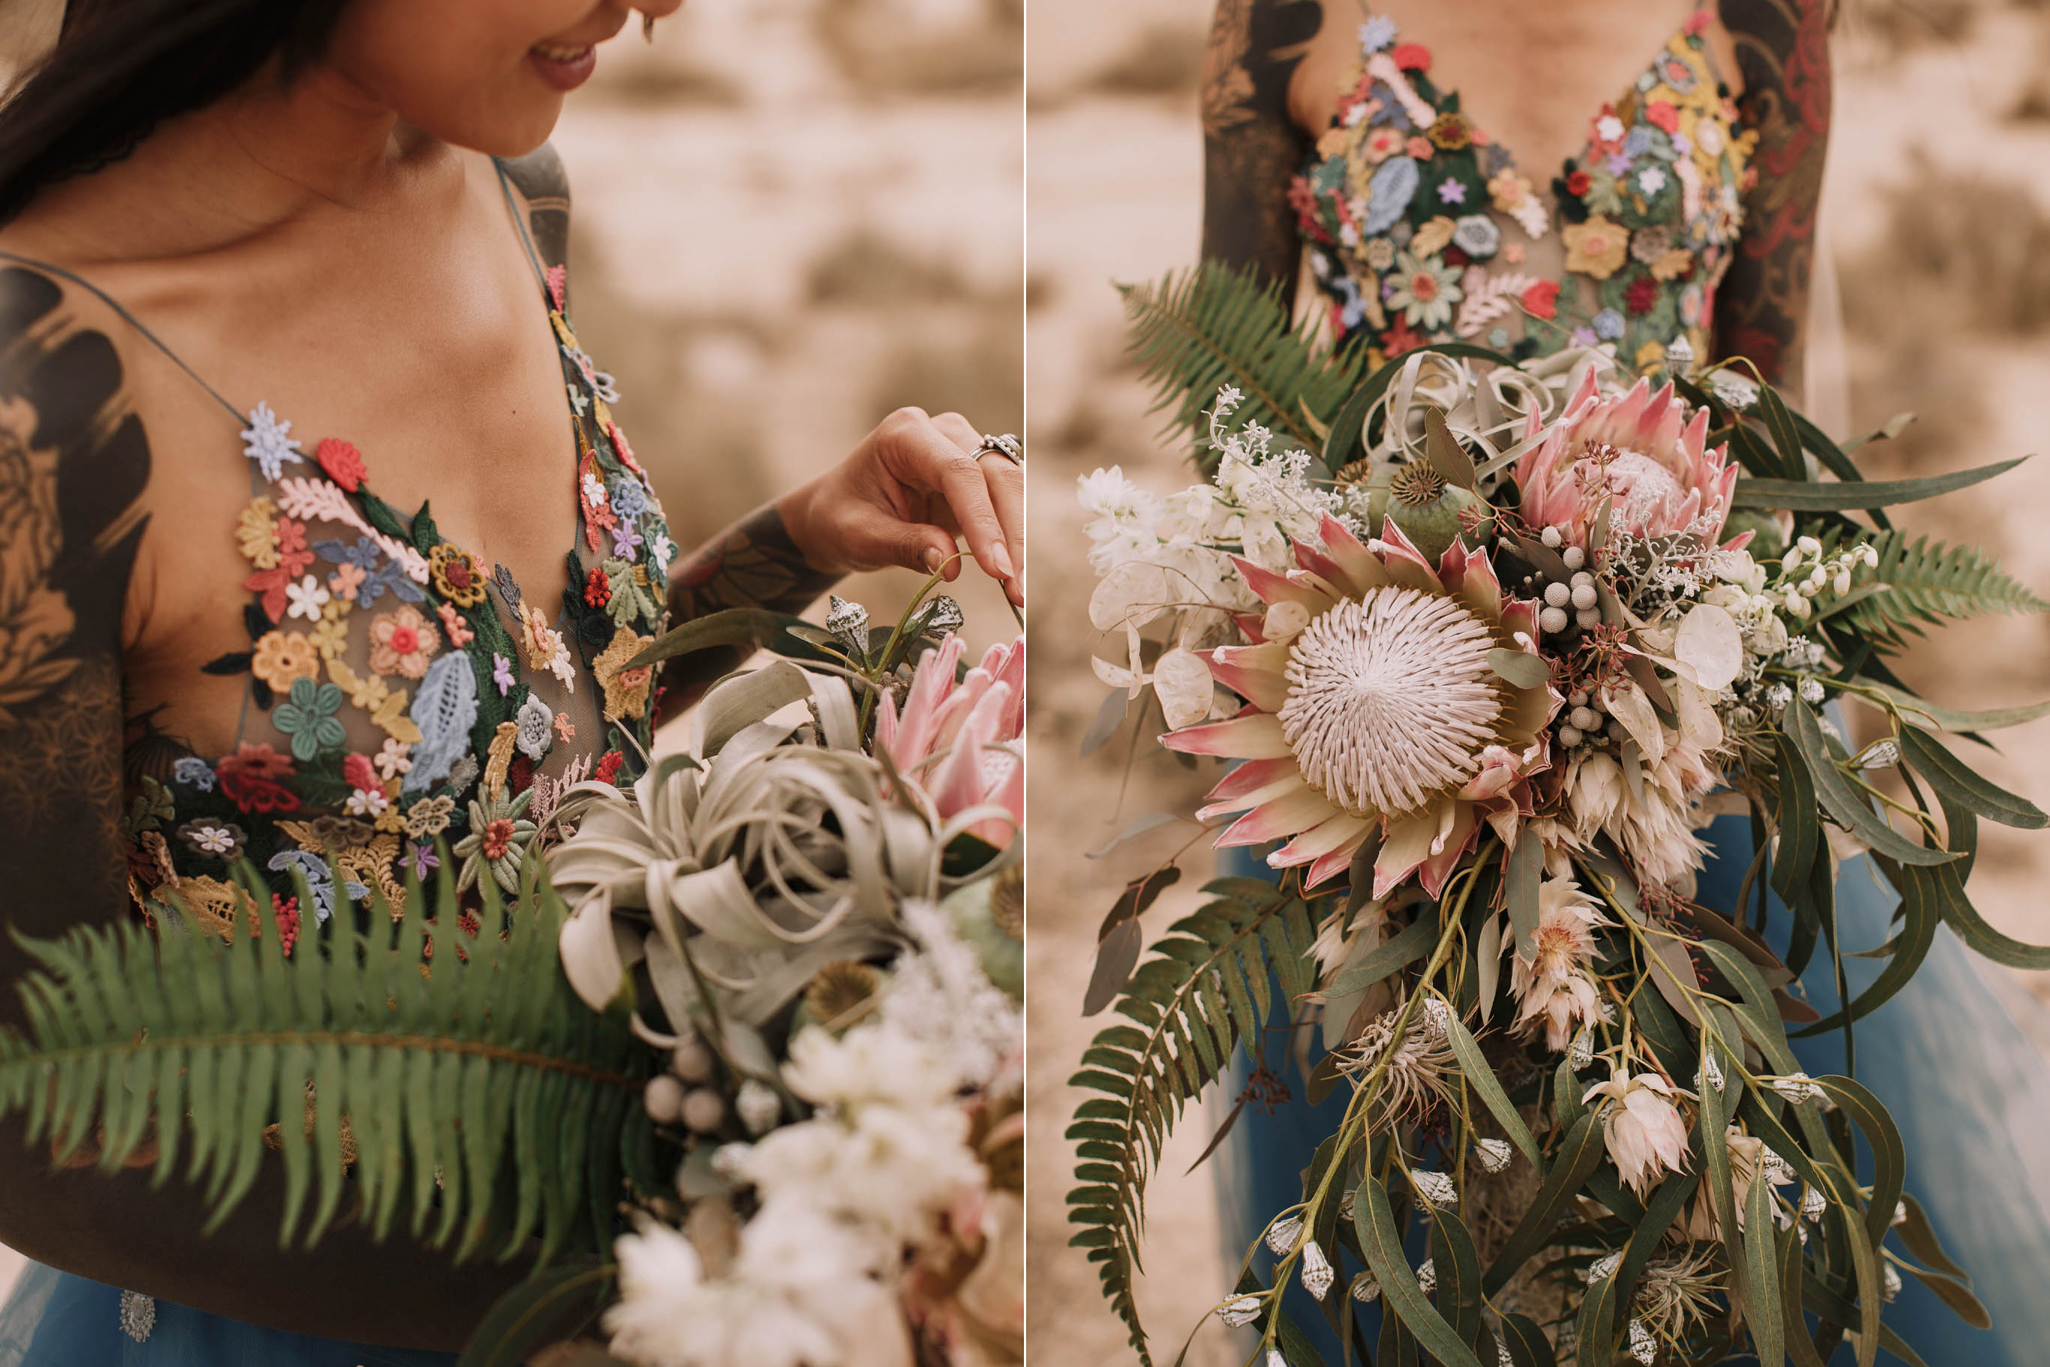 Spain-wedding-photographer-bardenas-reales-jeremy-boyer-photographe-mariage-bordeaux-floral-wedding-dress-robe-70.jpg